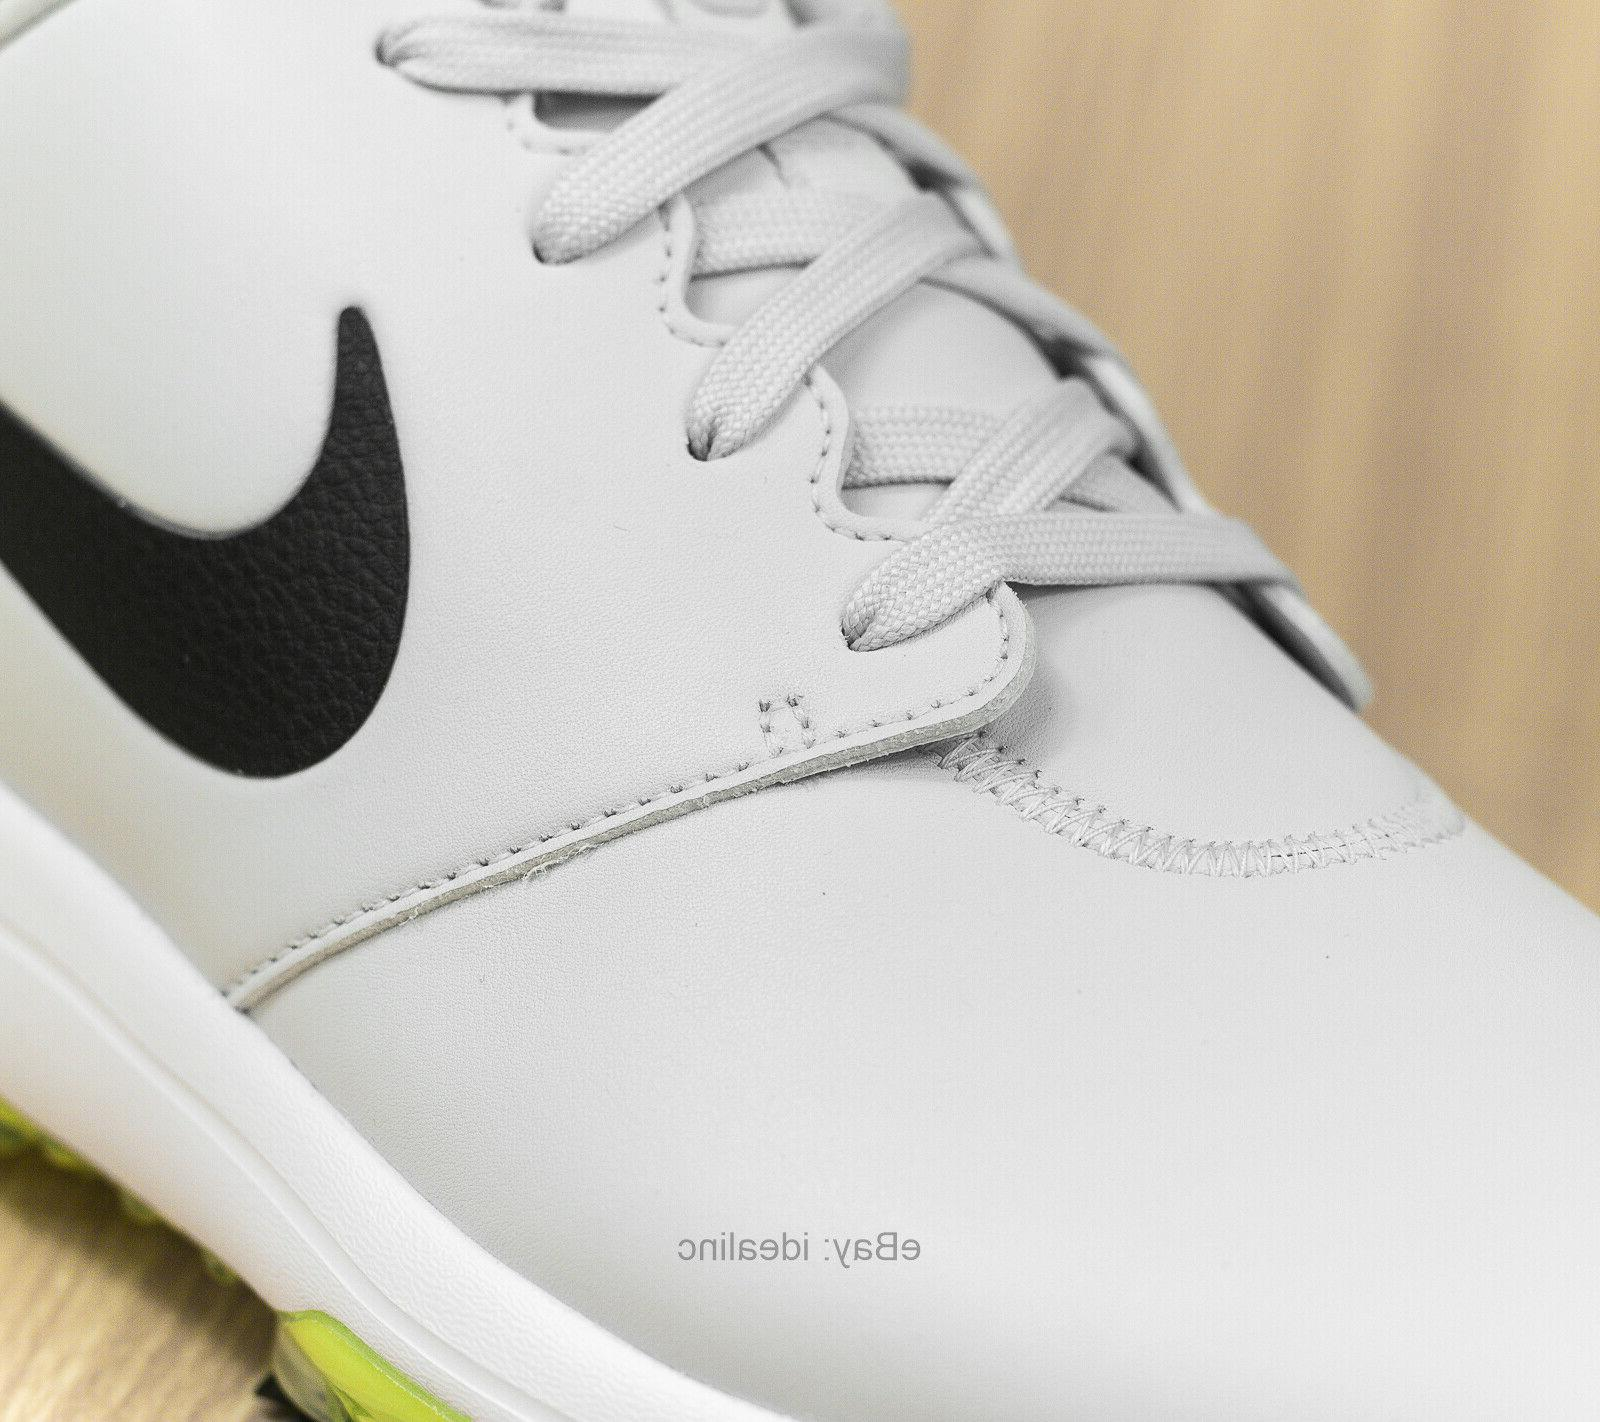 Nike G Golf Shoes Pure Platinum Waterproof 9.5